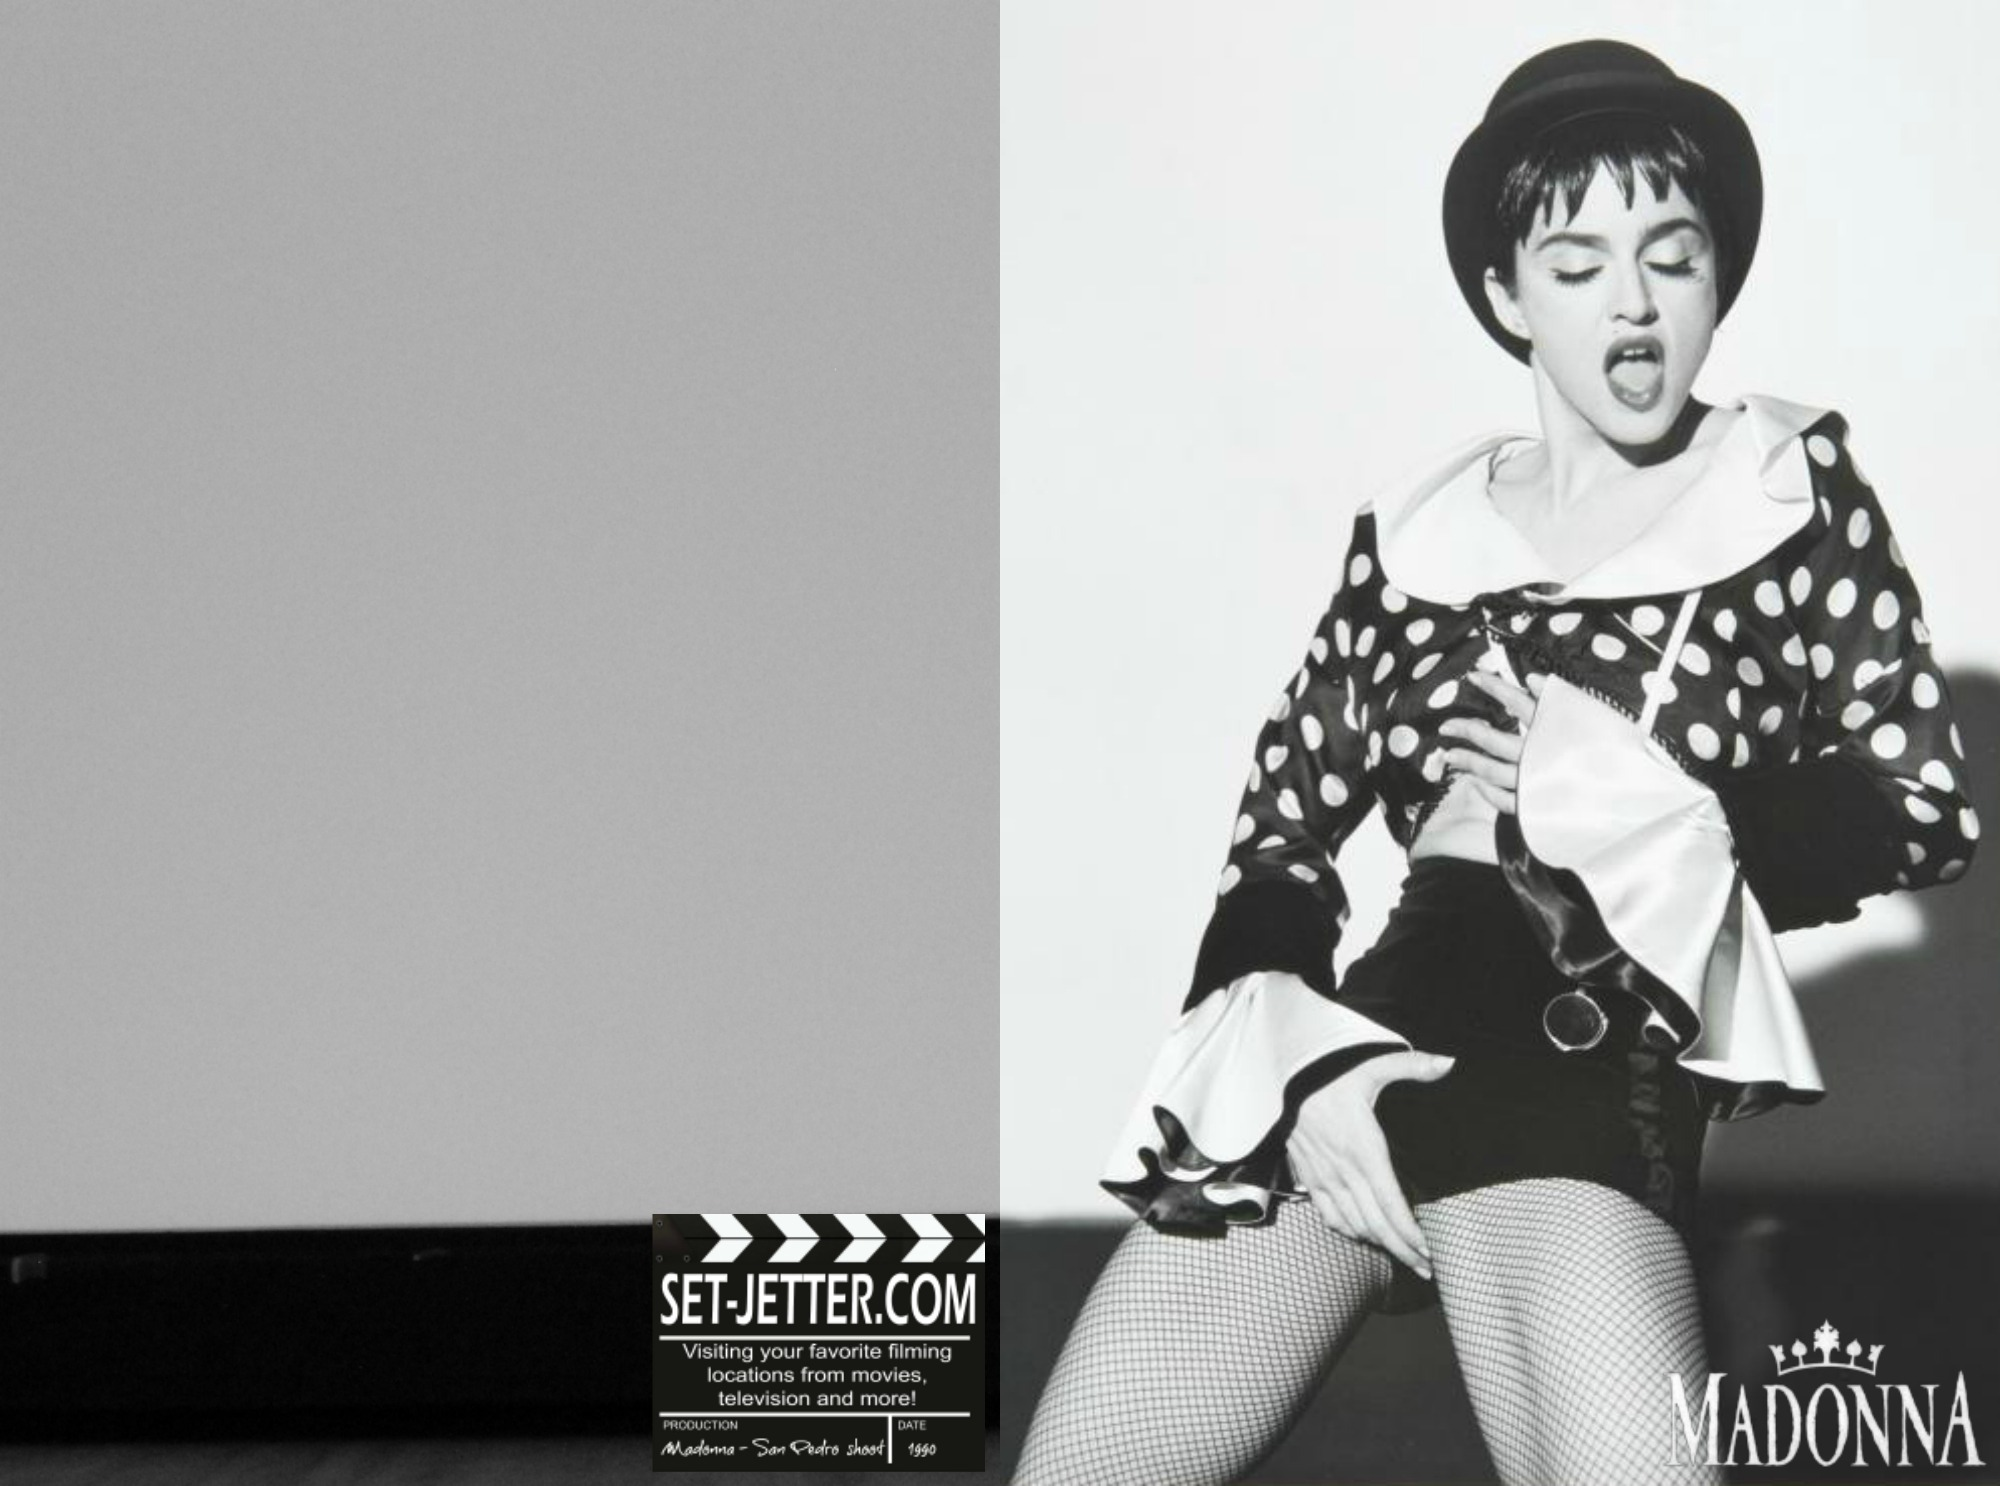 Madonna-HerbRitts-05a.jpg